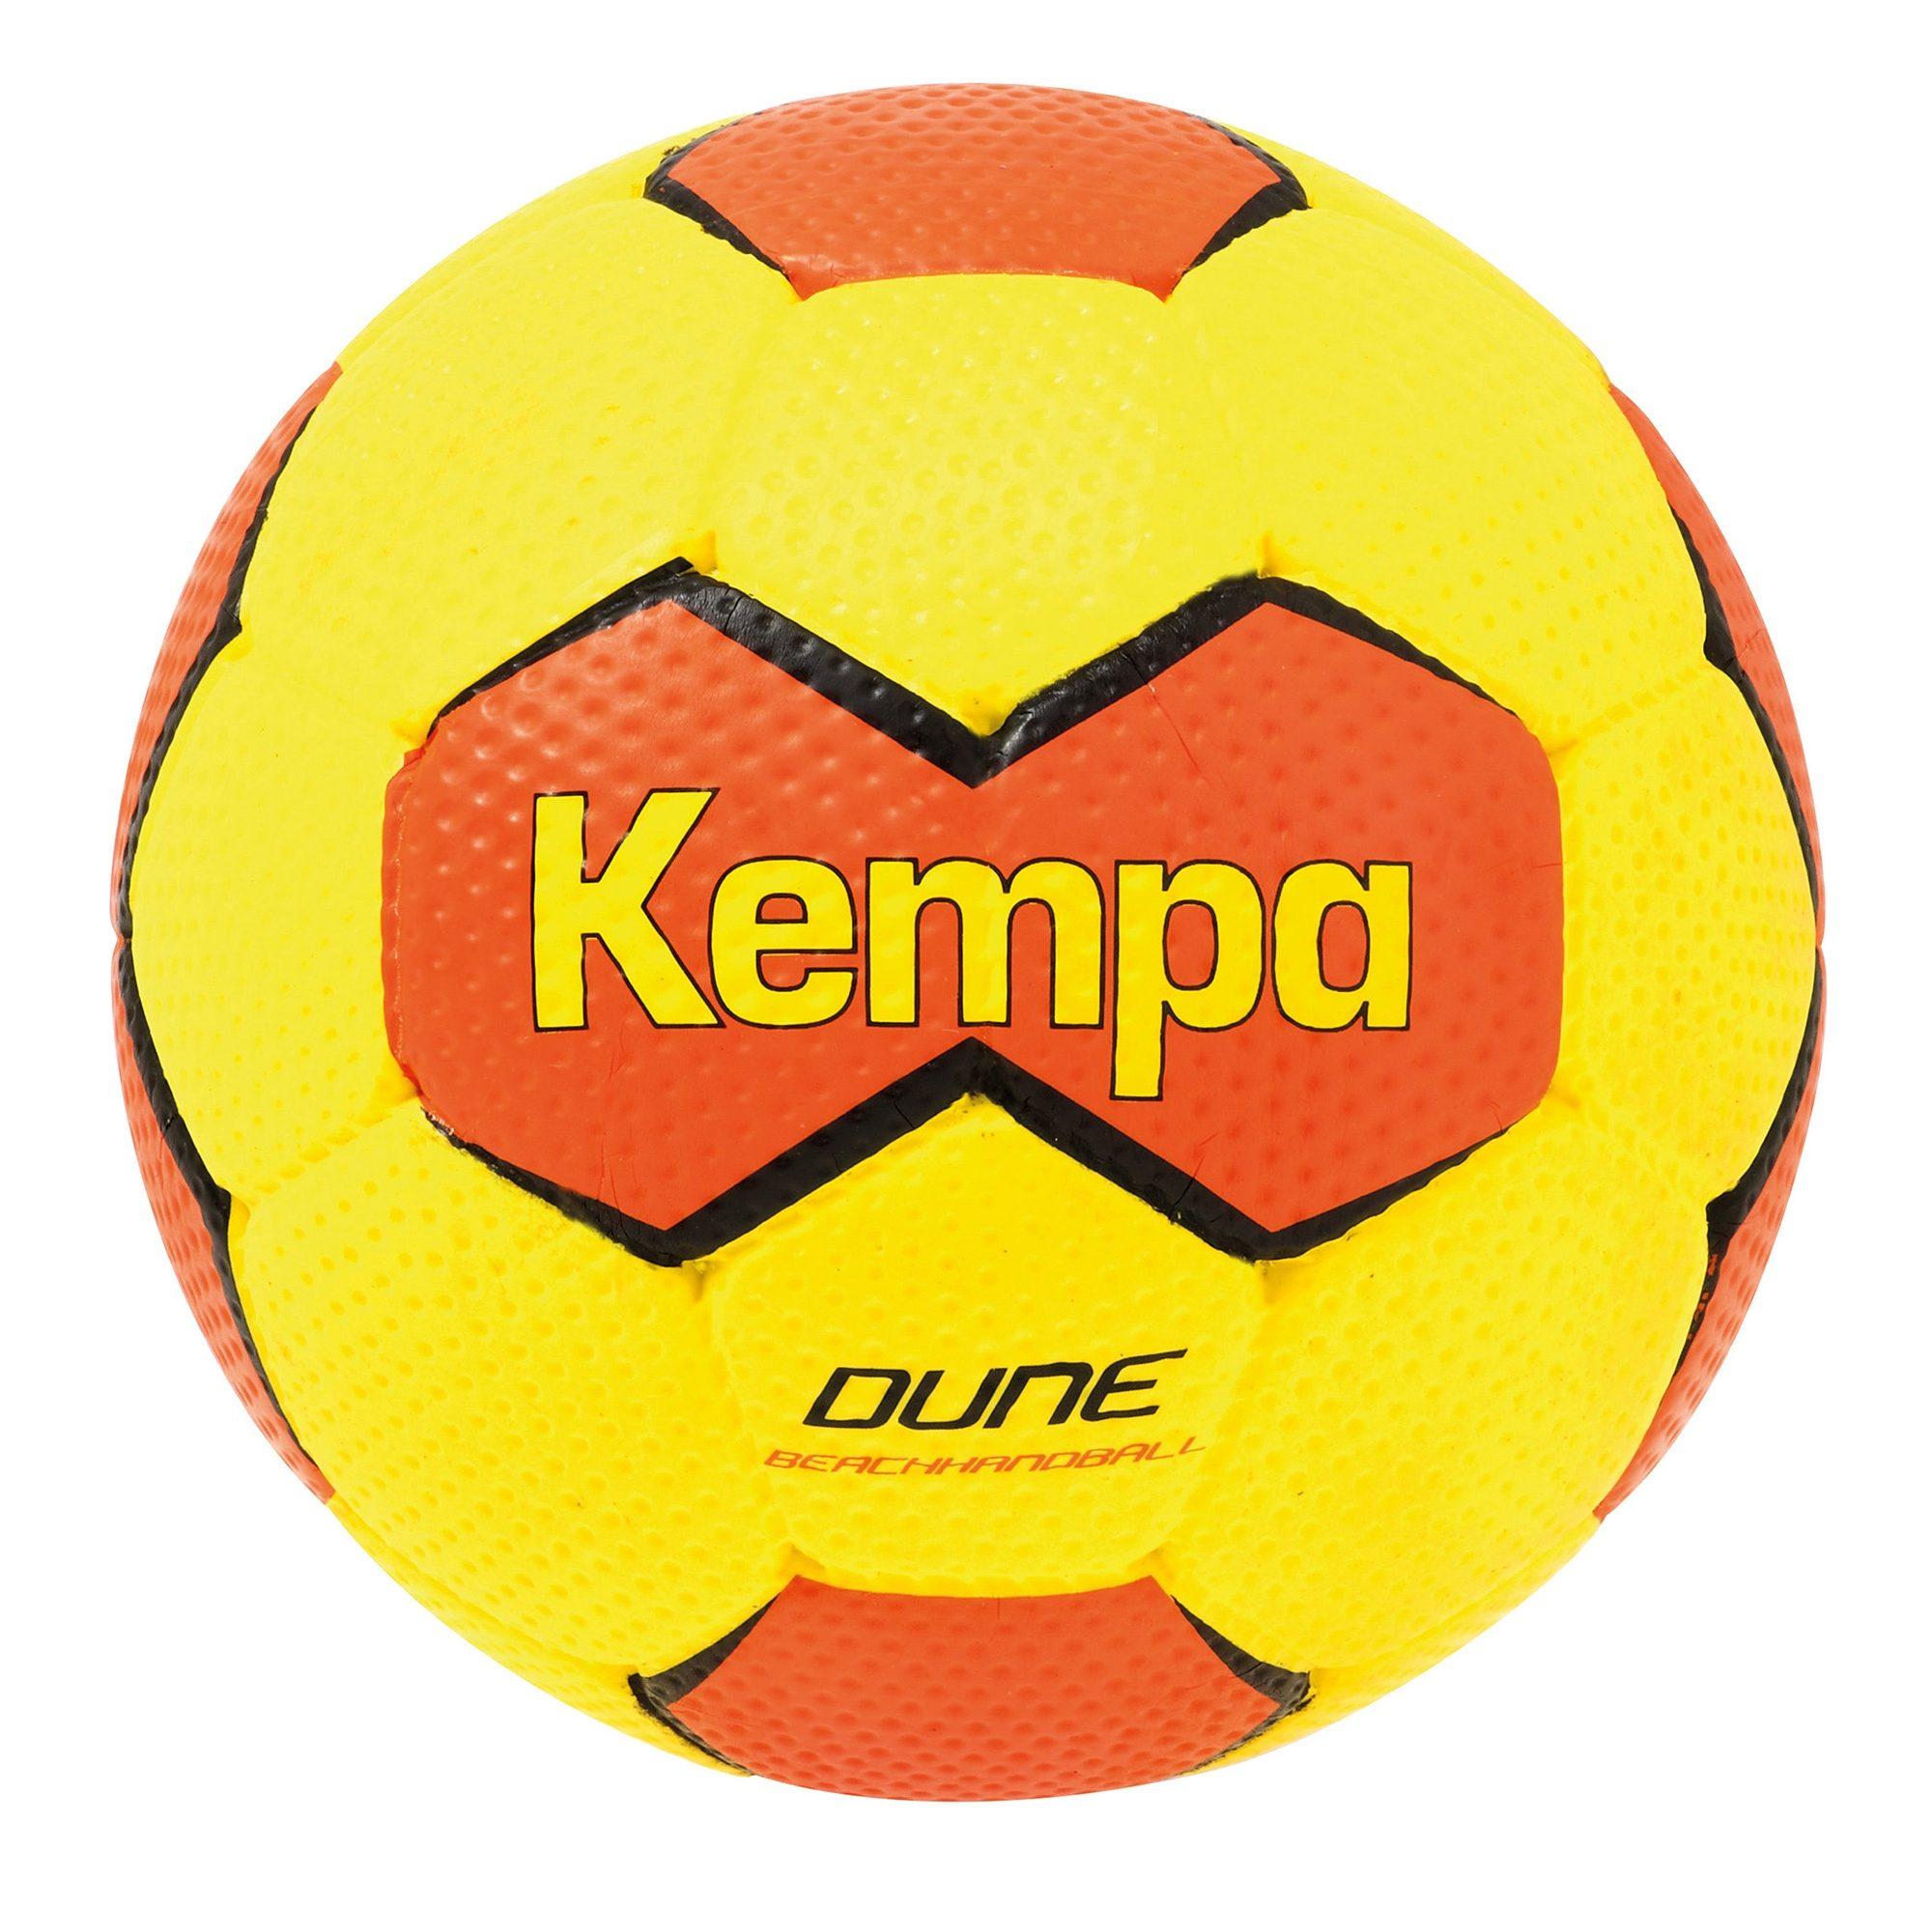 KEMPA Dune Handball